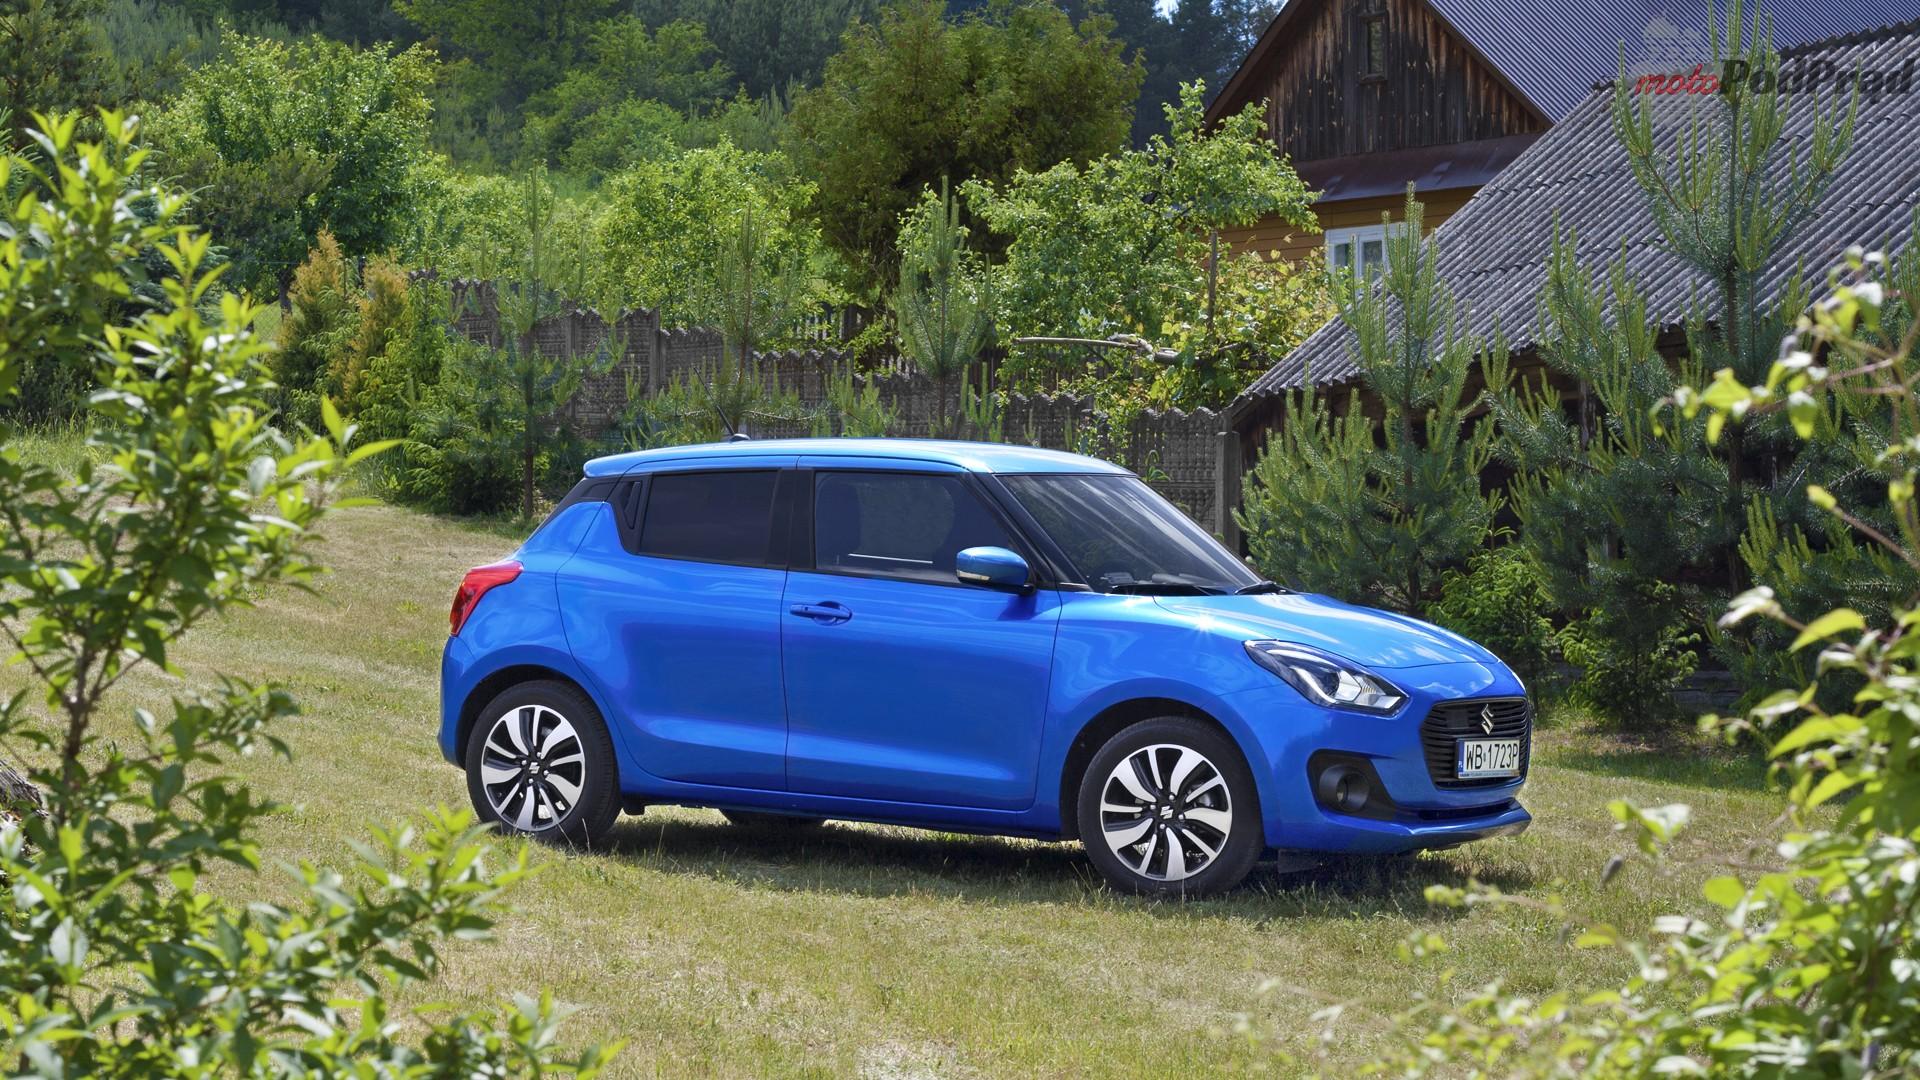 suzuki swift bok 2 Test: Suzuki Swift 1.2 DualJet SHVS